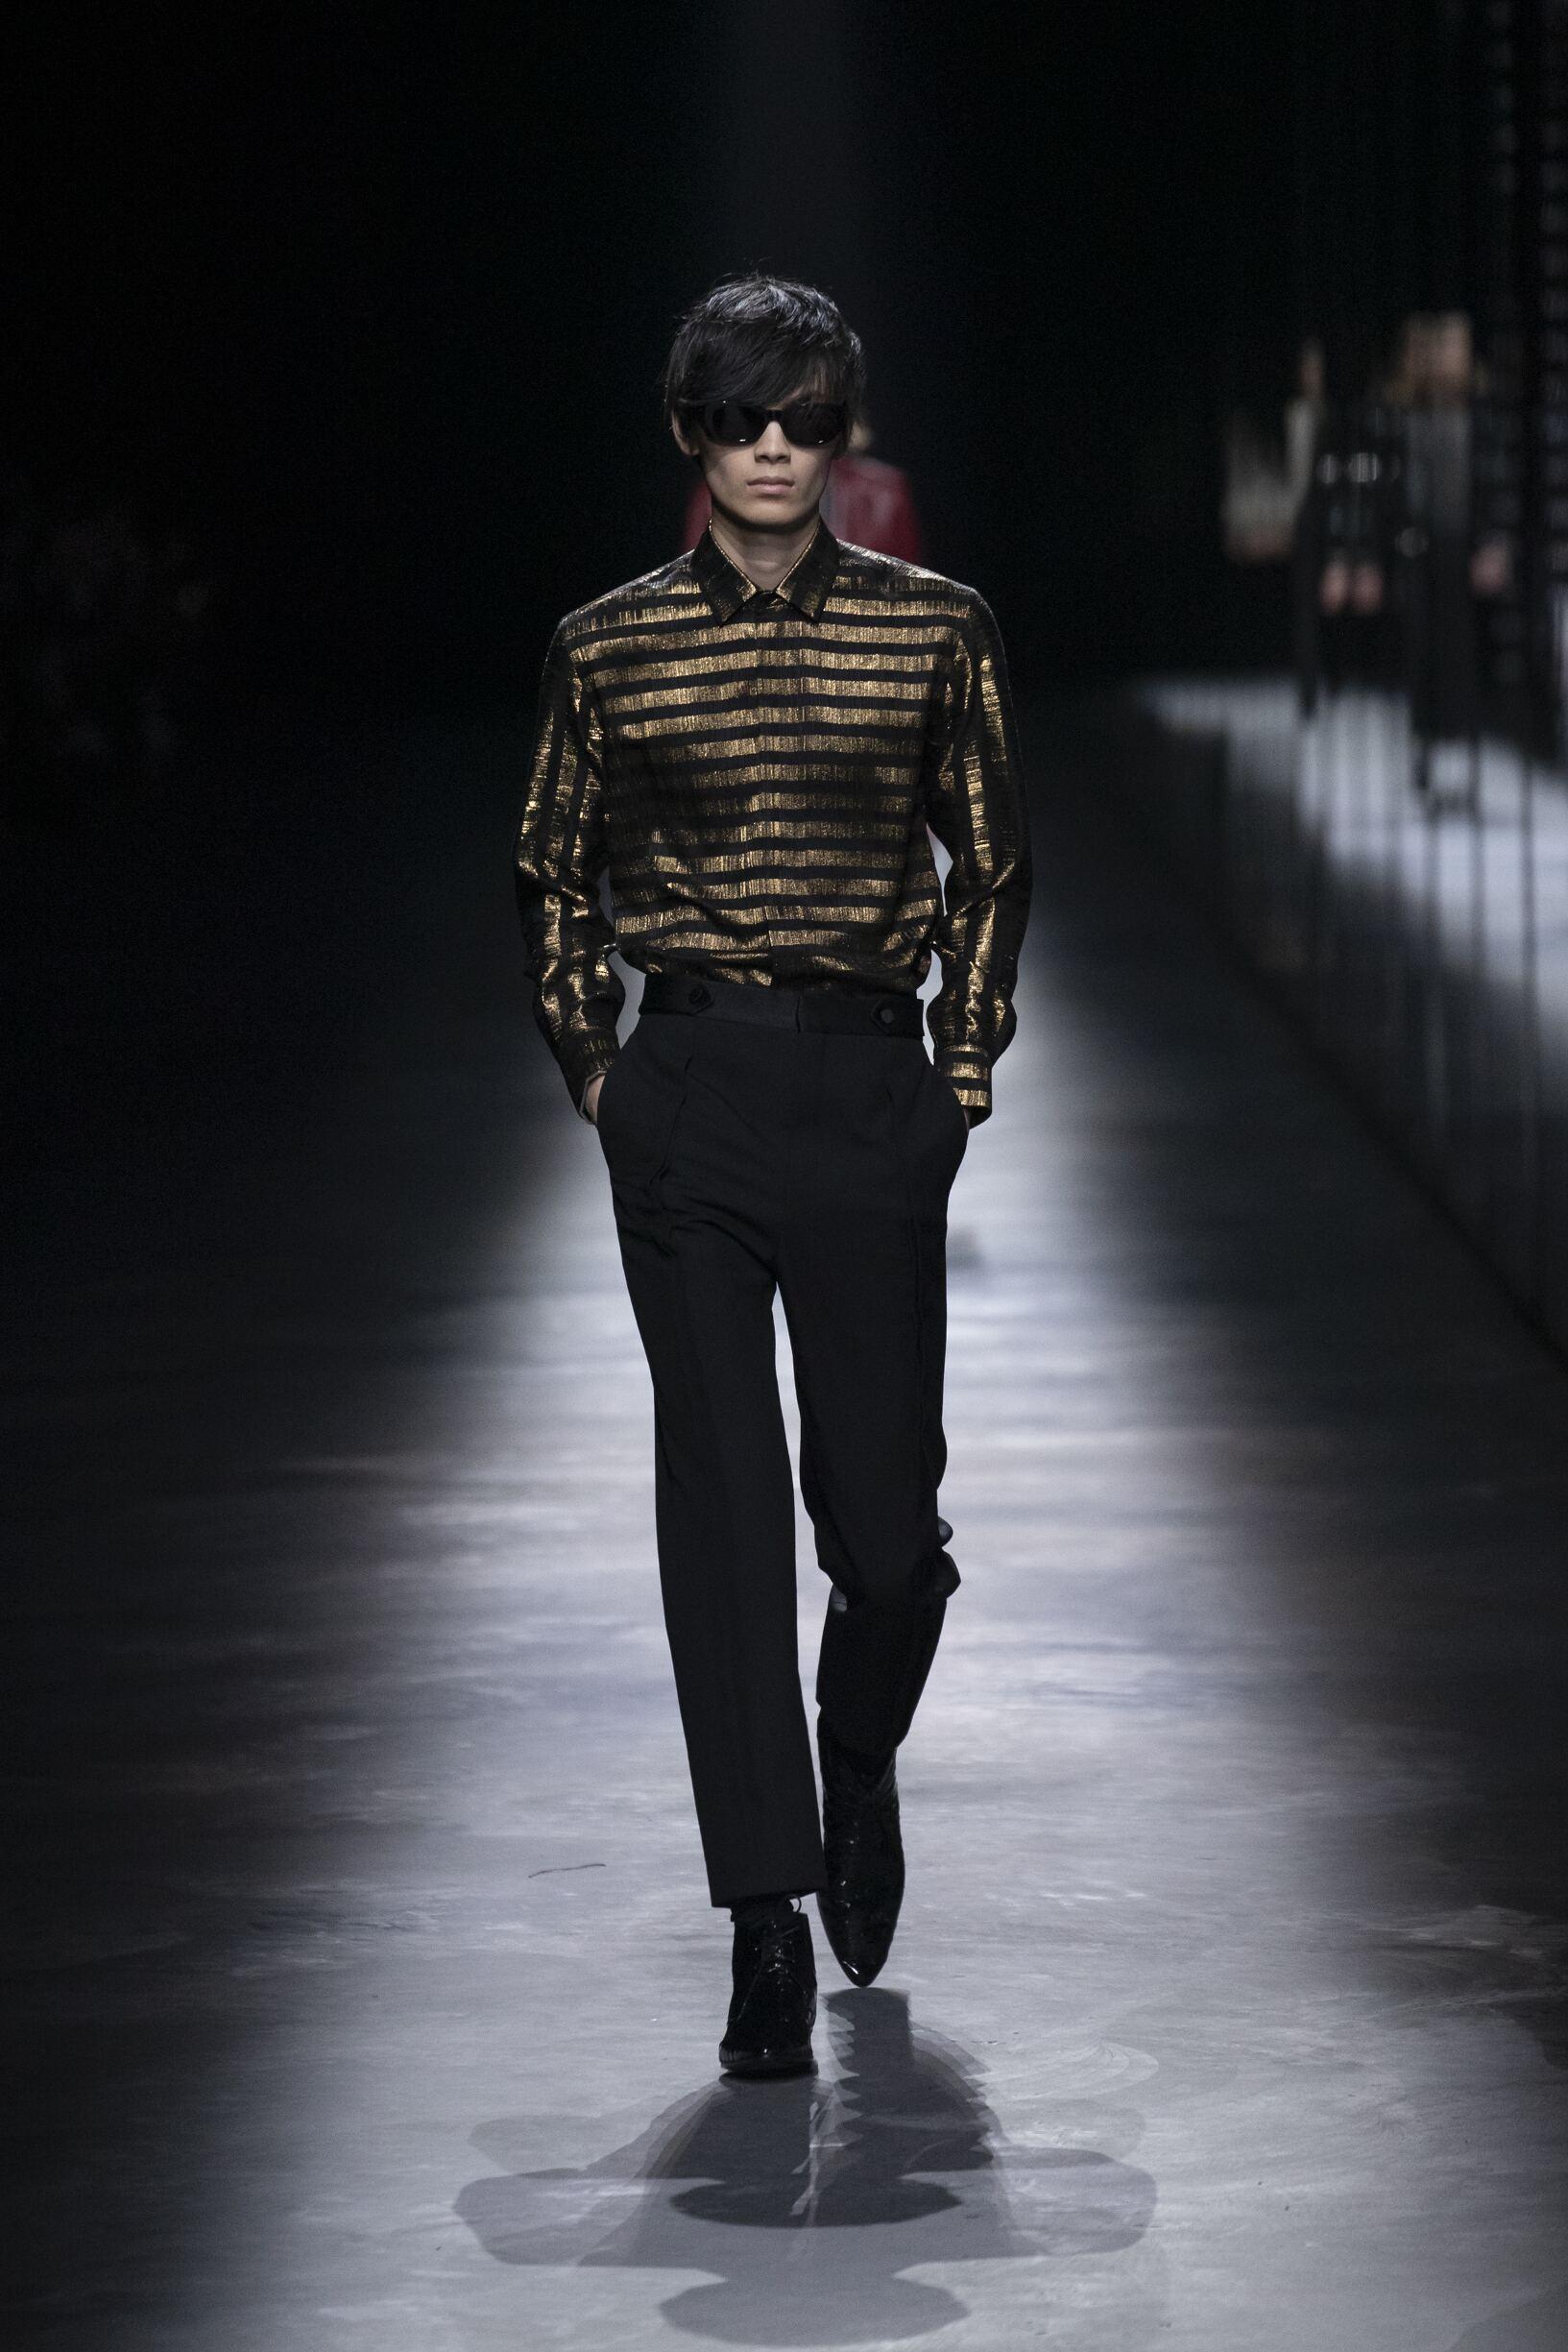 Fashion Week 2019 Catwalk Saint Laurent